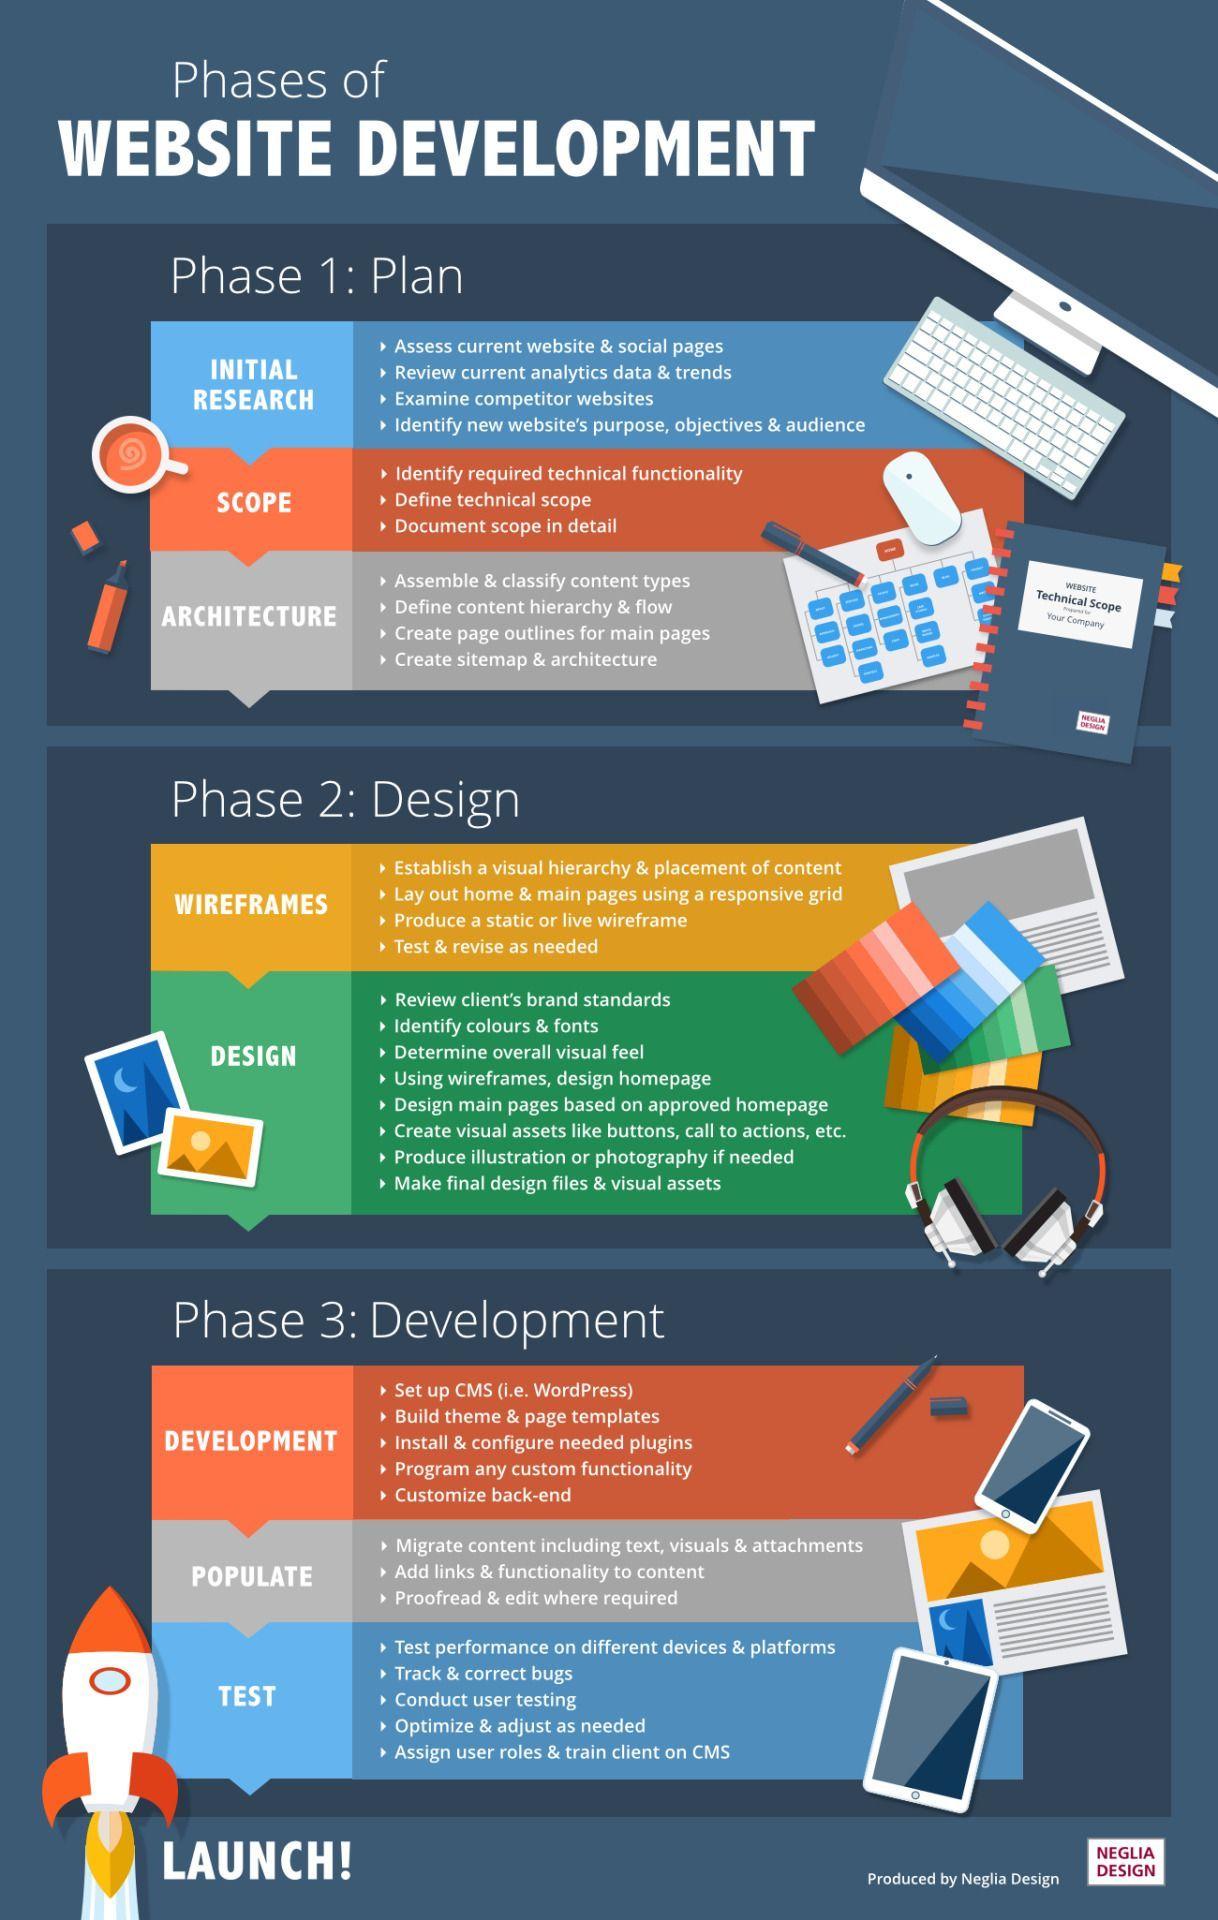 9 Marvelous Diy Ideas Passive Income India Make Money Blogging Debt Payoff Make Money From Web Development Design Website Development Process Web Design Tips